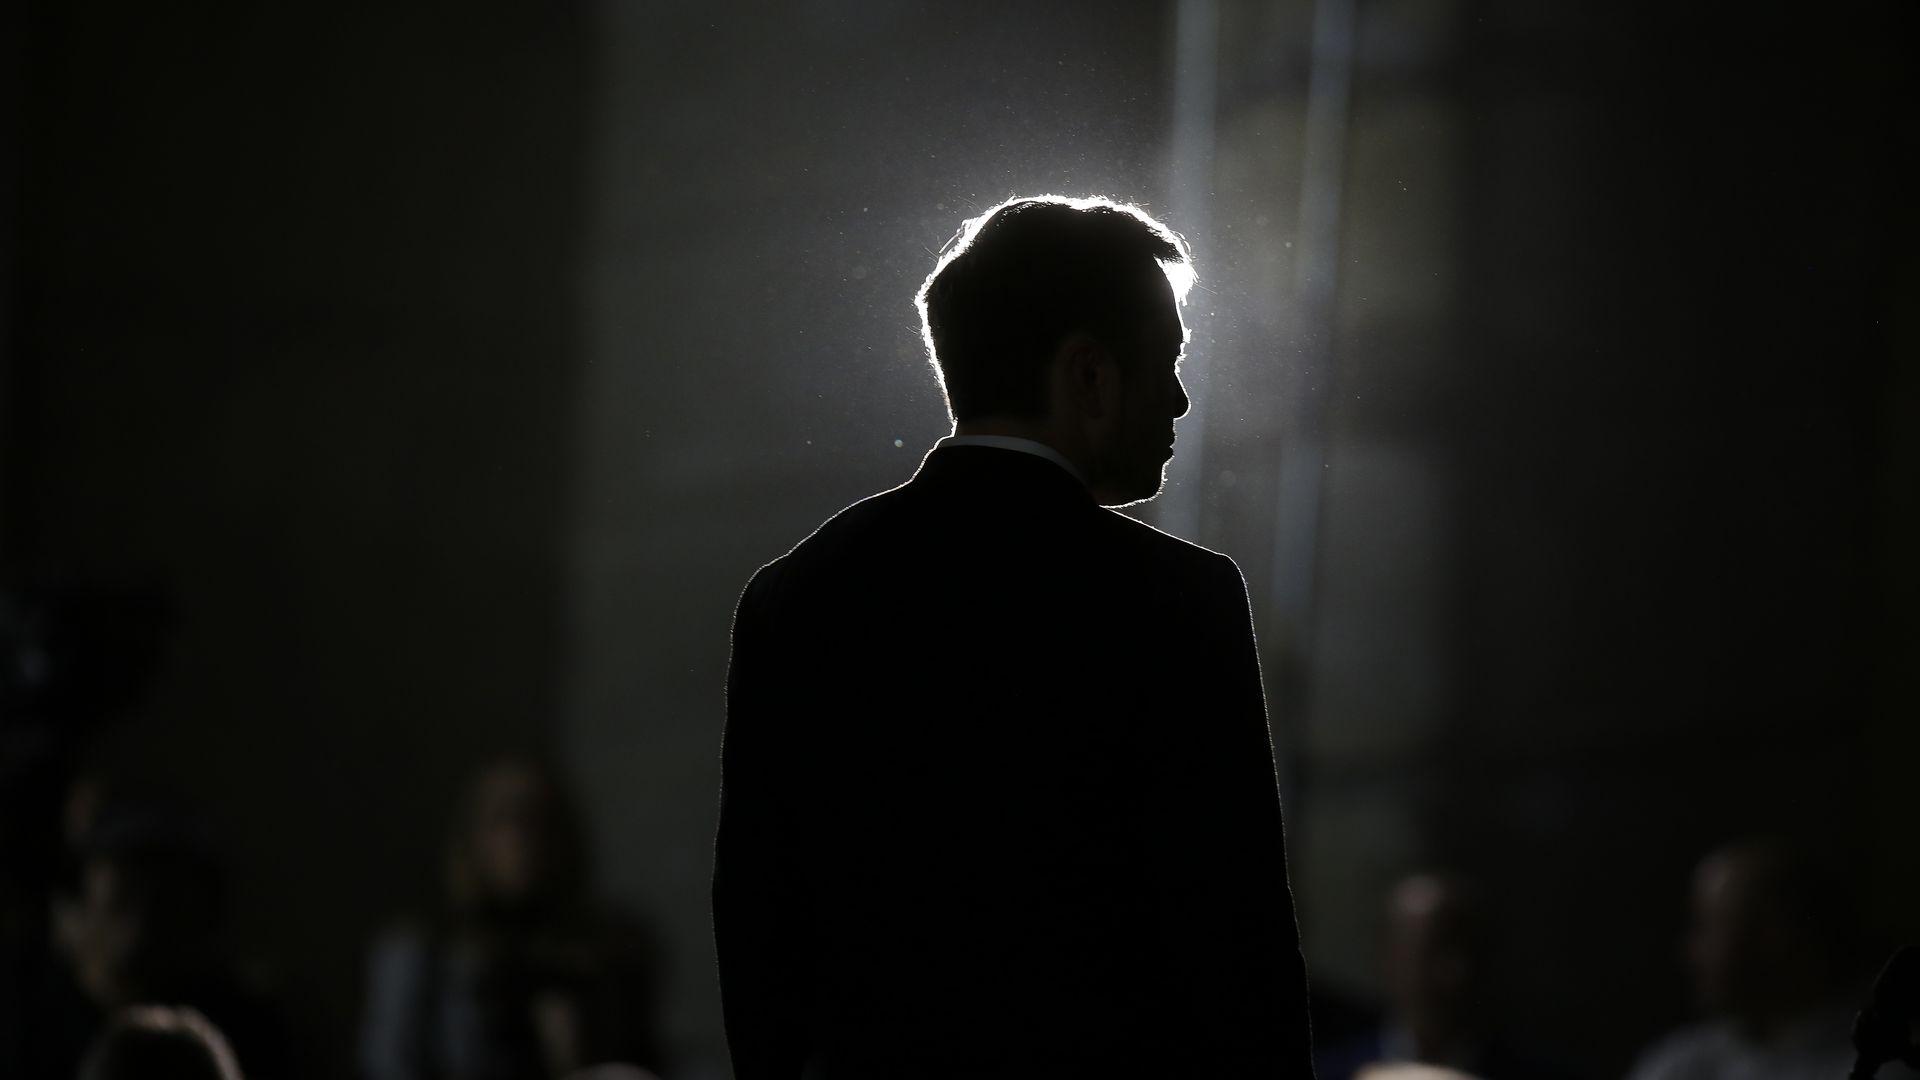 Silhouette of Tesla CEO Elon Musk.